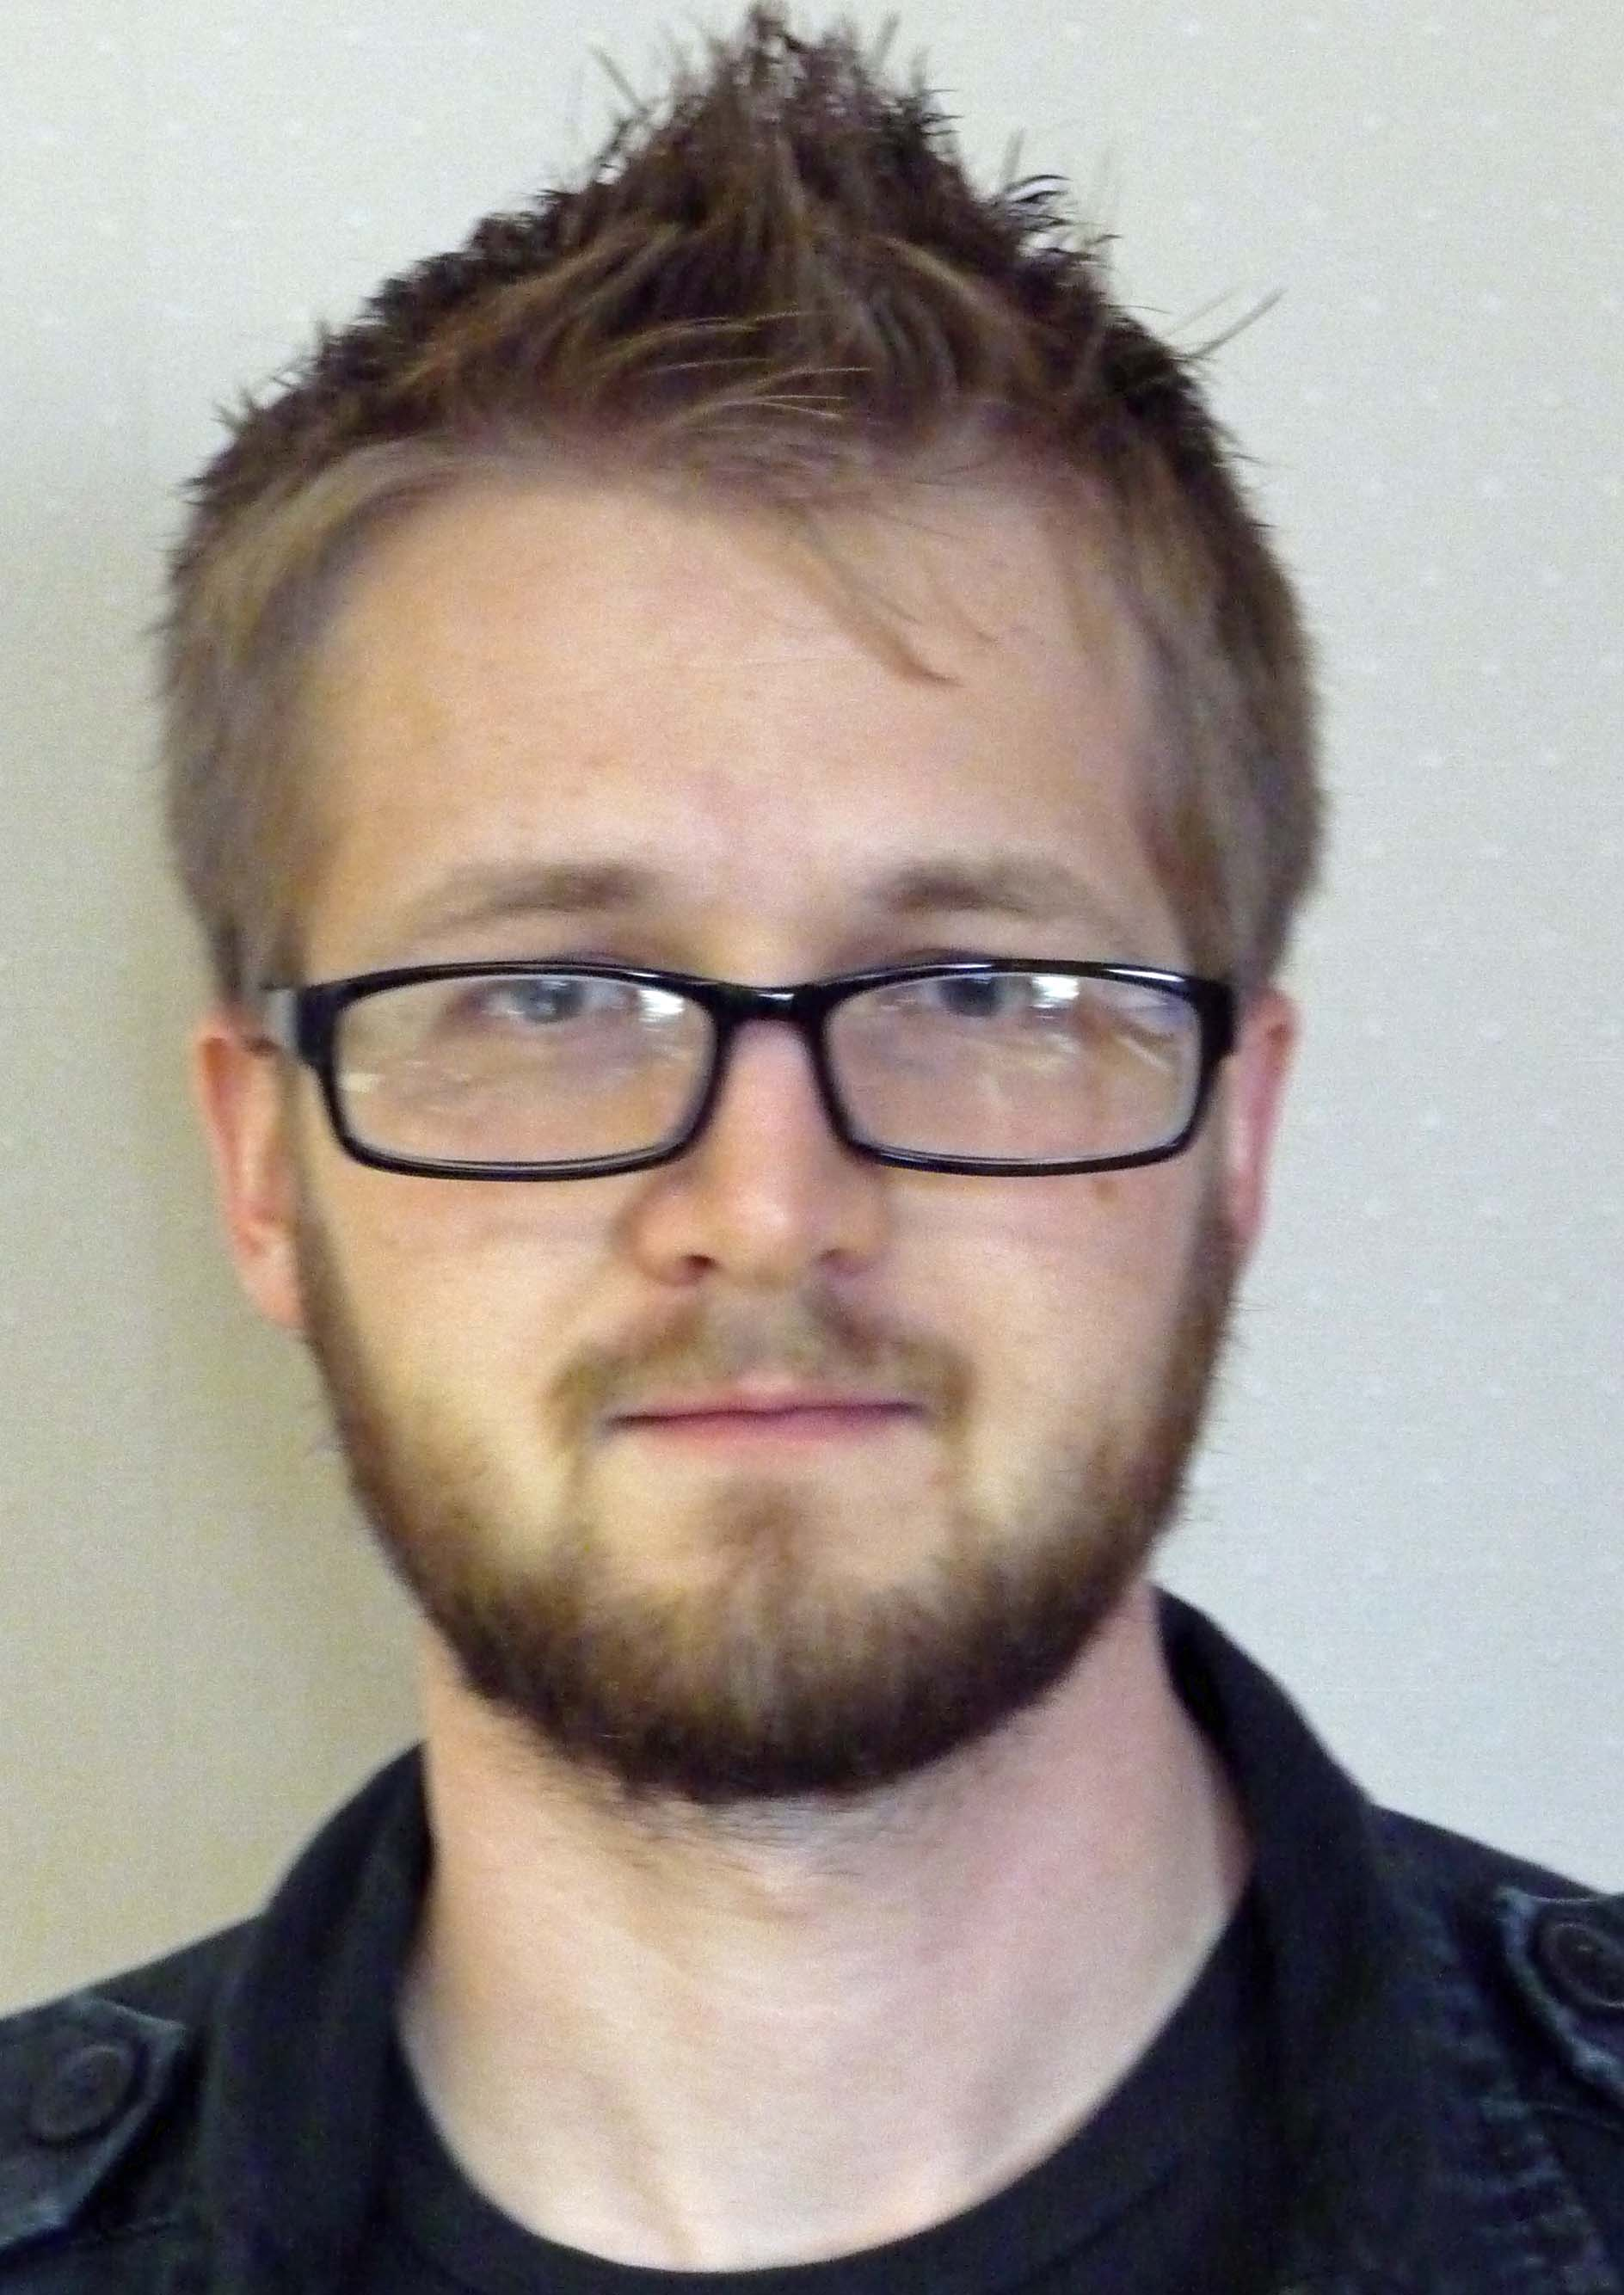 headshot of Ethan Moll